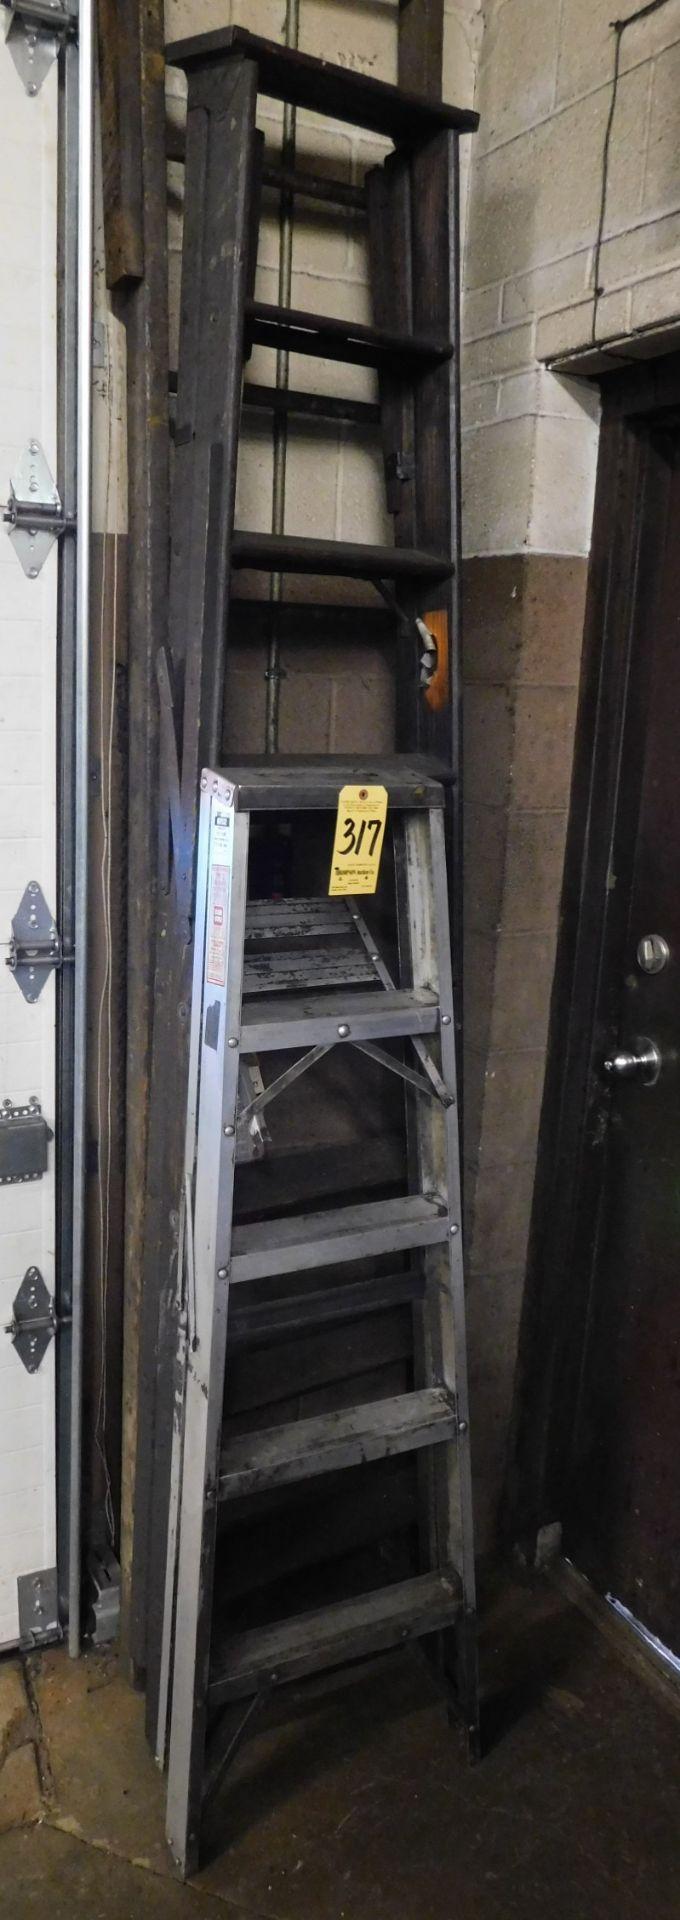 Lot 317 - 5' Aluminum Step Ladder